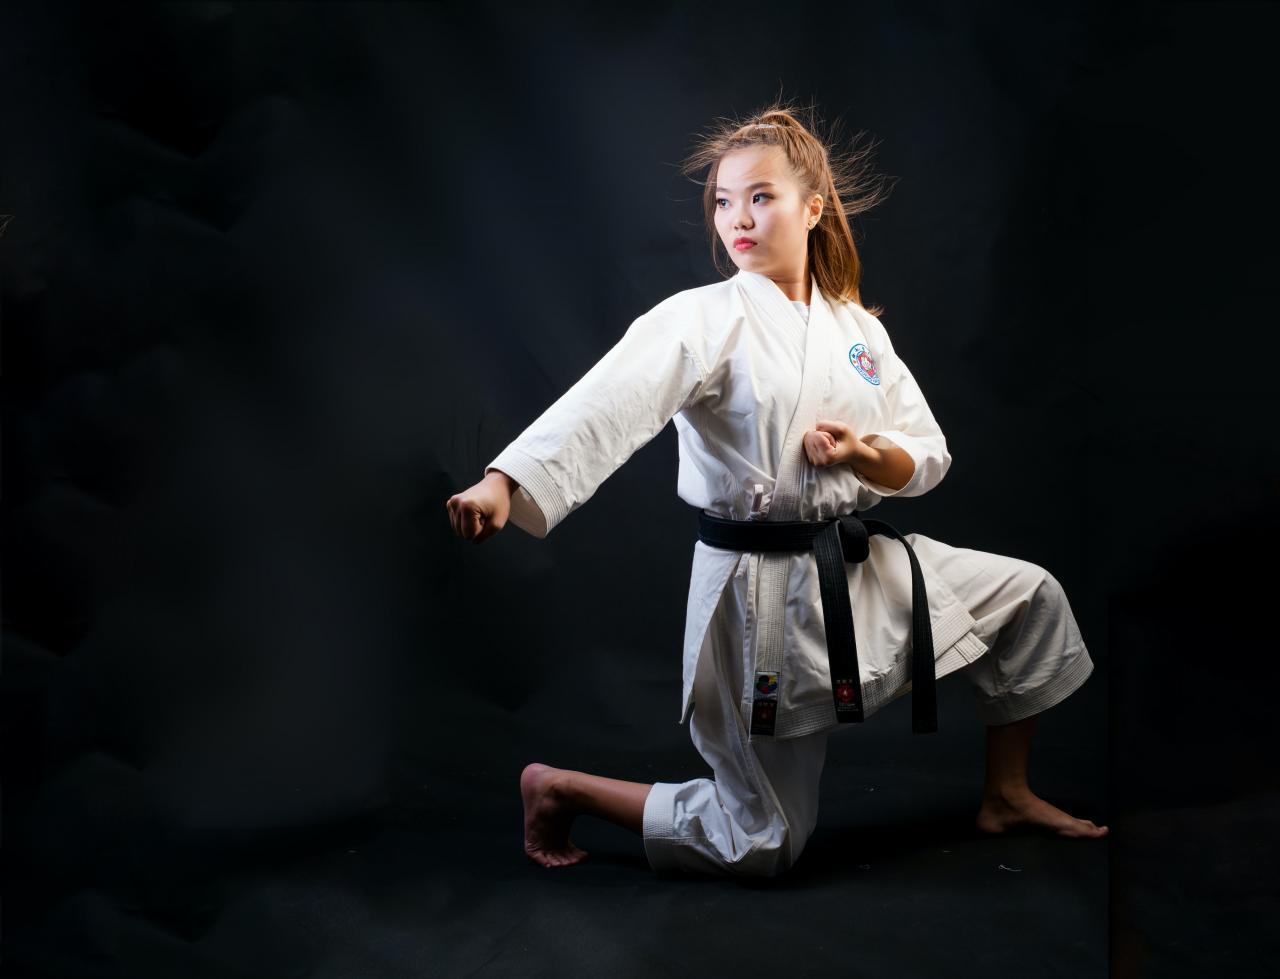 woman judo